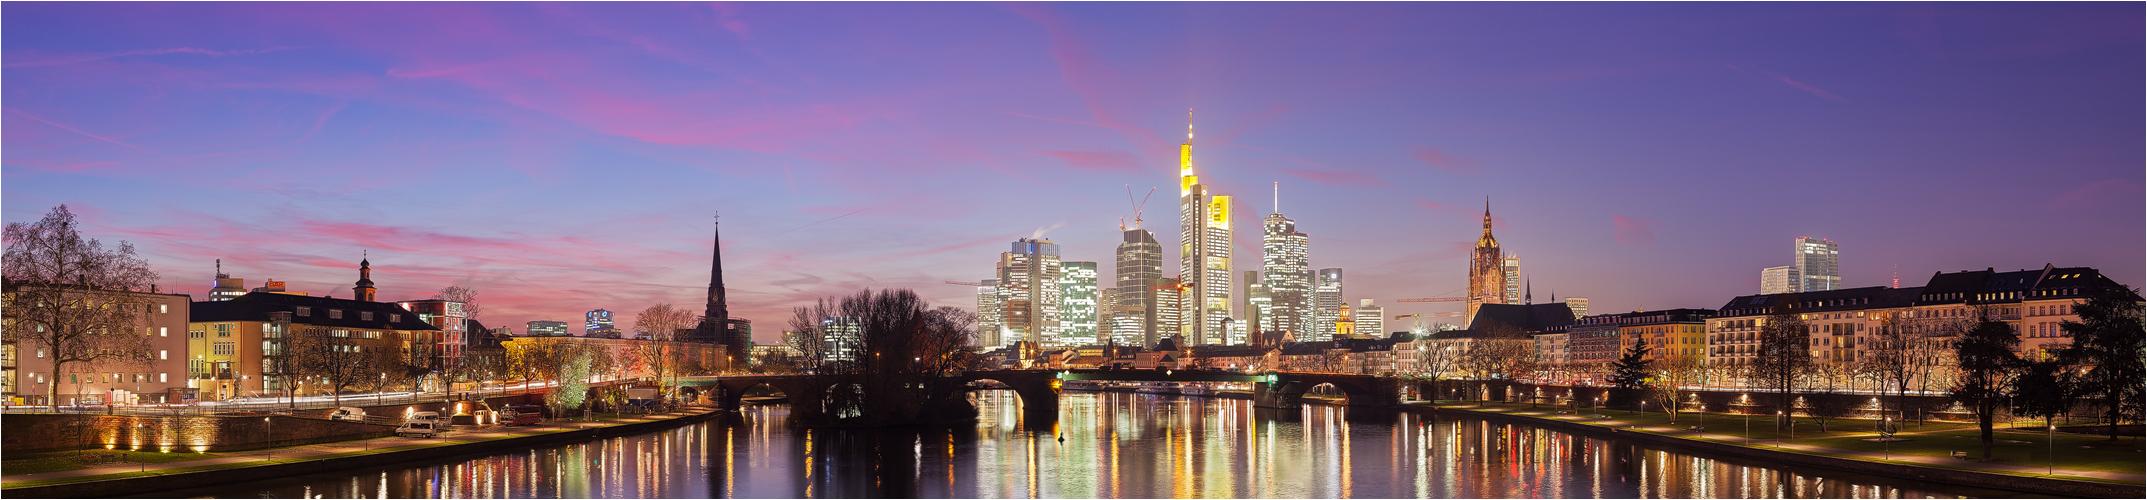 frankfurt_1884_panorama02